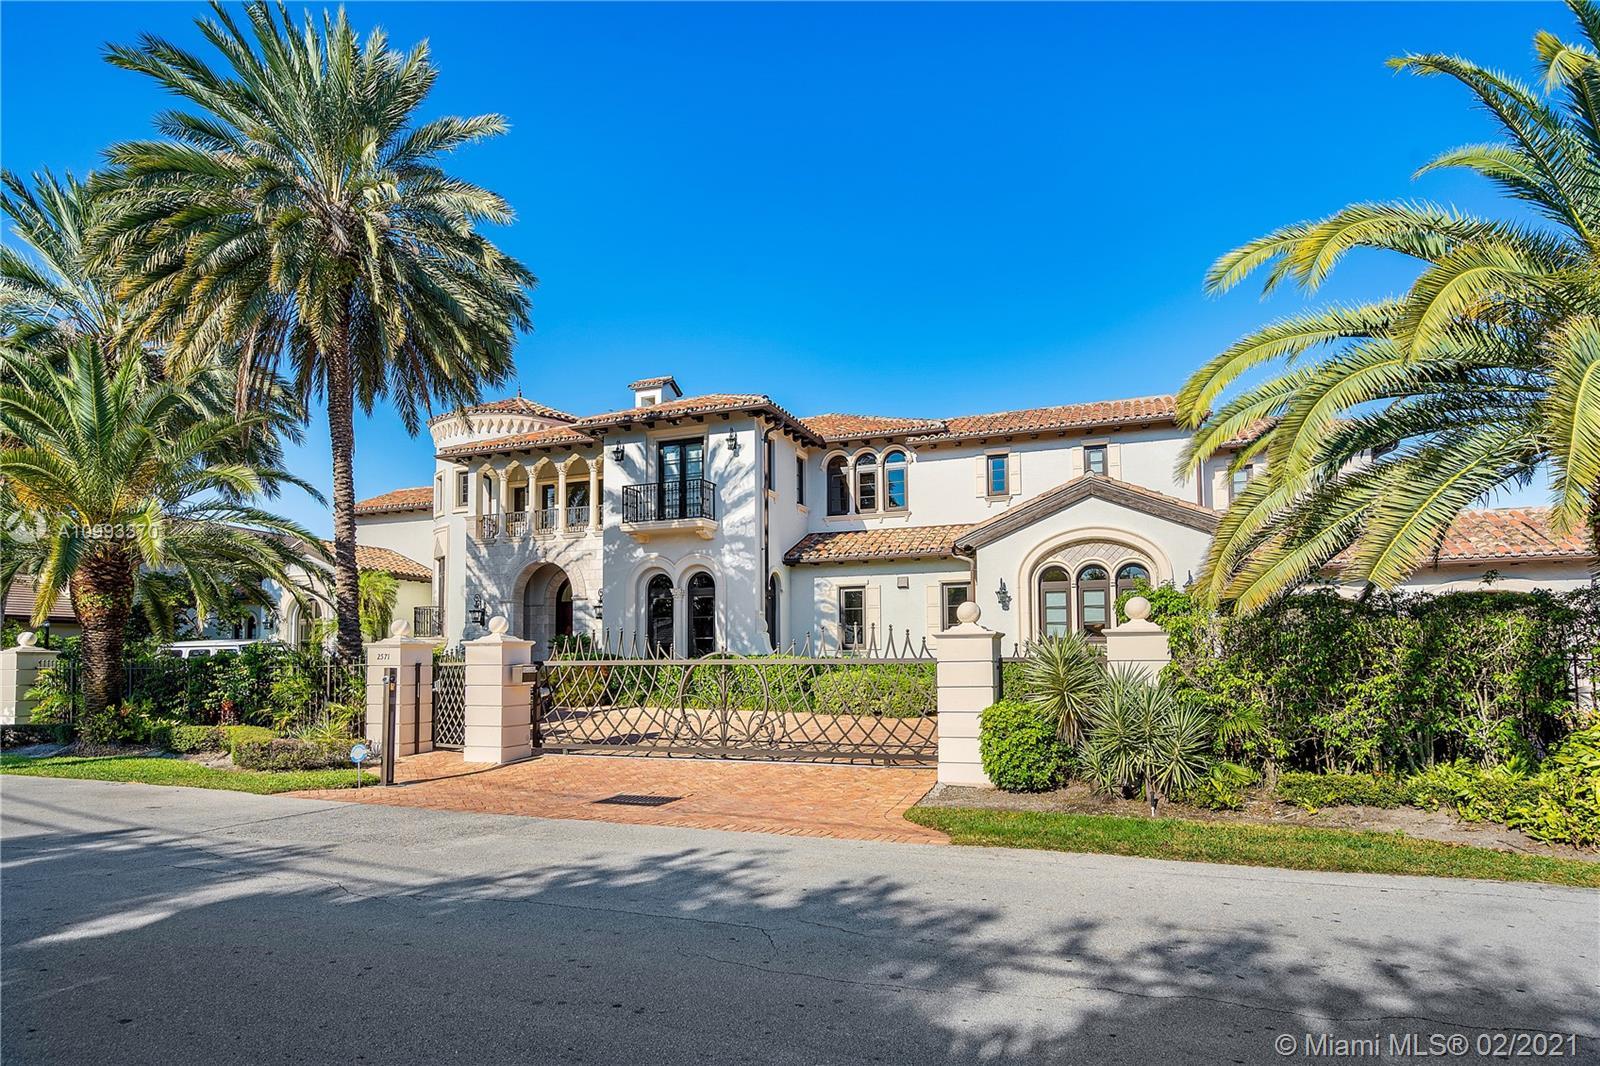 2571 Del Lago Dr Luxury Real Estate